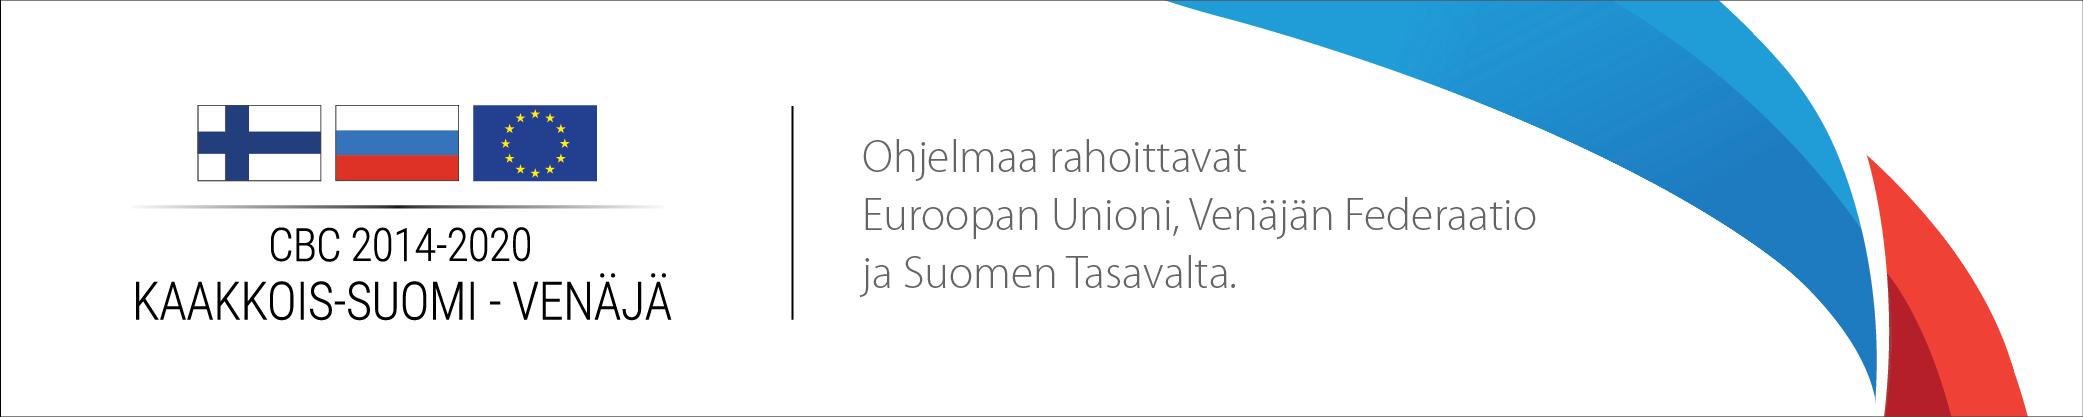 sefr-cbc-programme-banner_1500x300px_finnish